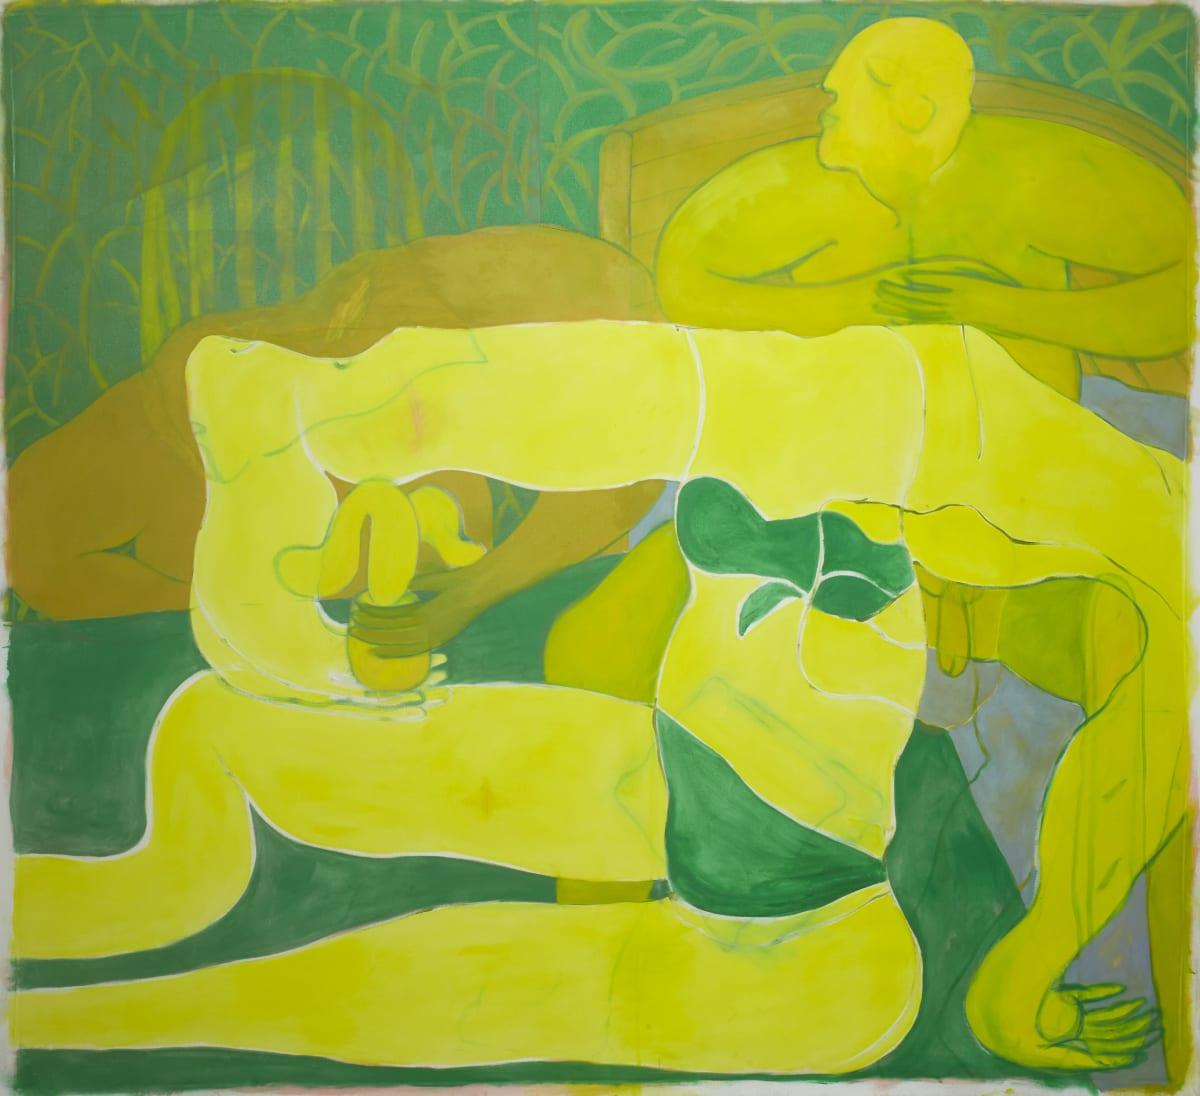 Tahnee Lonsdale Posing Yellow Figure, 2018 oil on canvas 190 x 210 cm 74 3/4 x 82 5/8 in